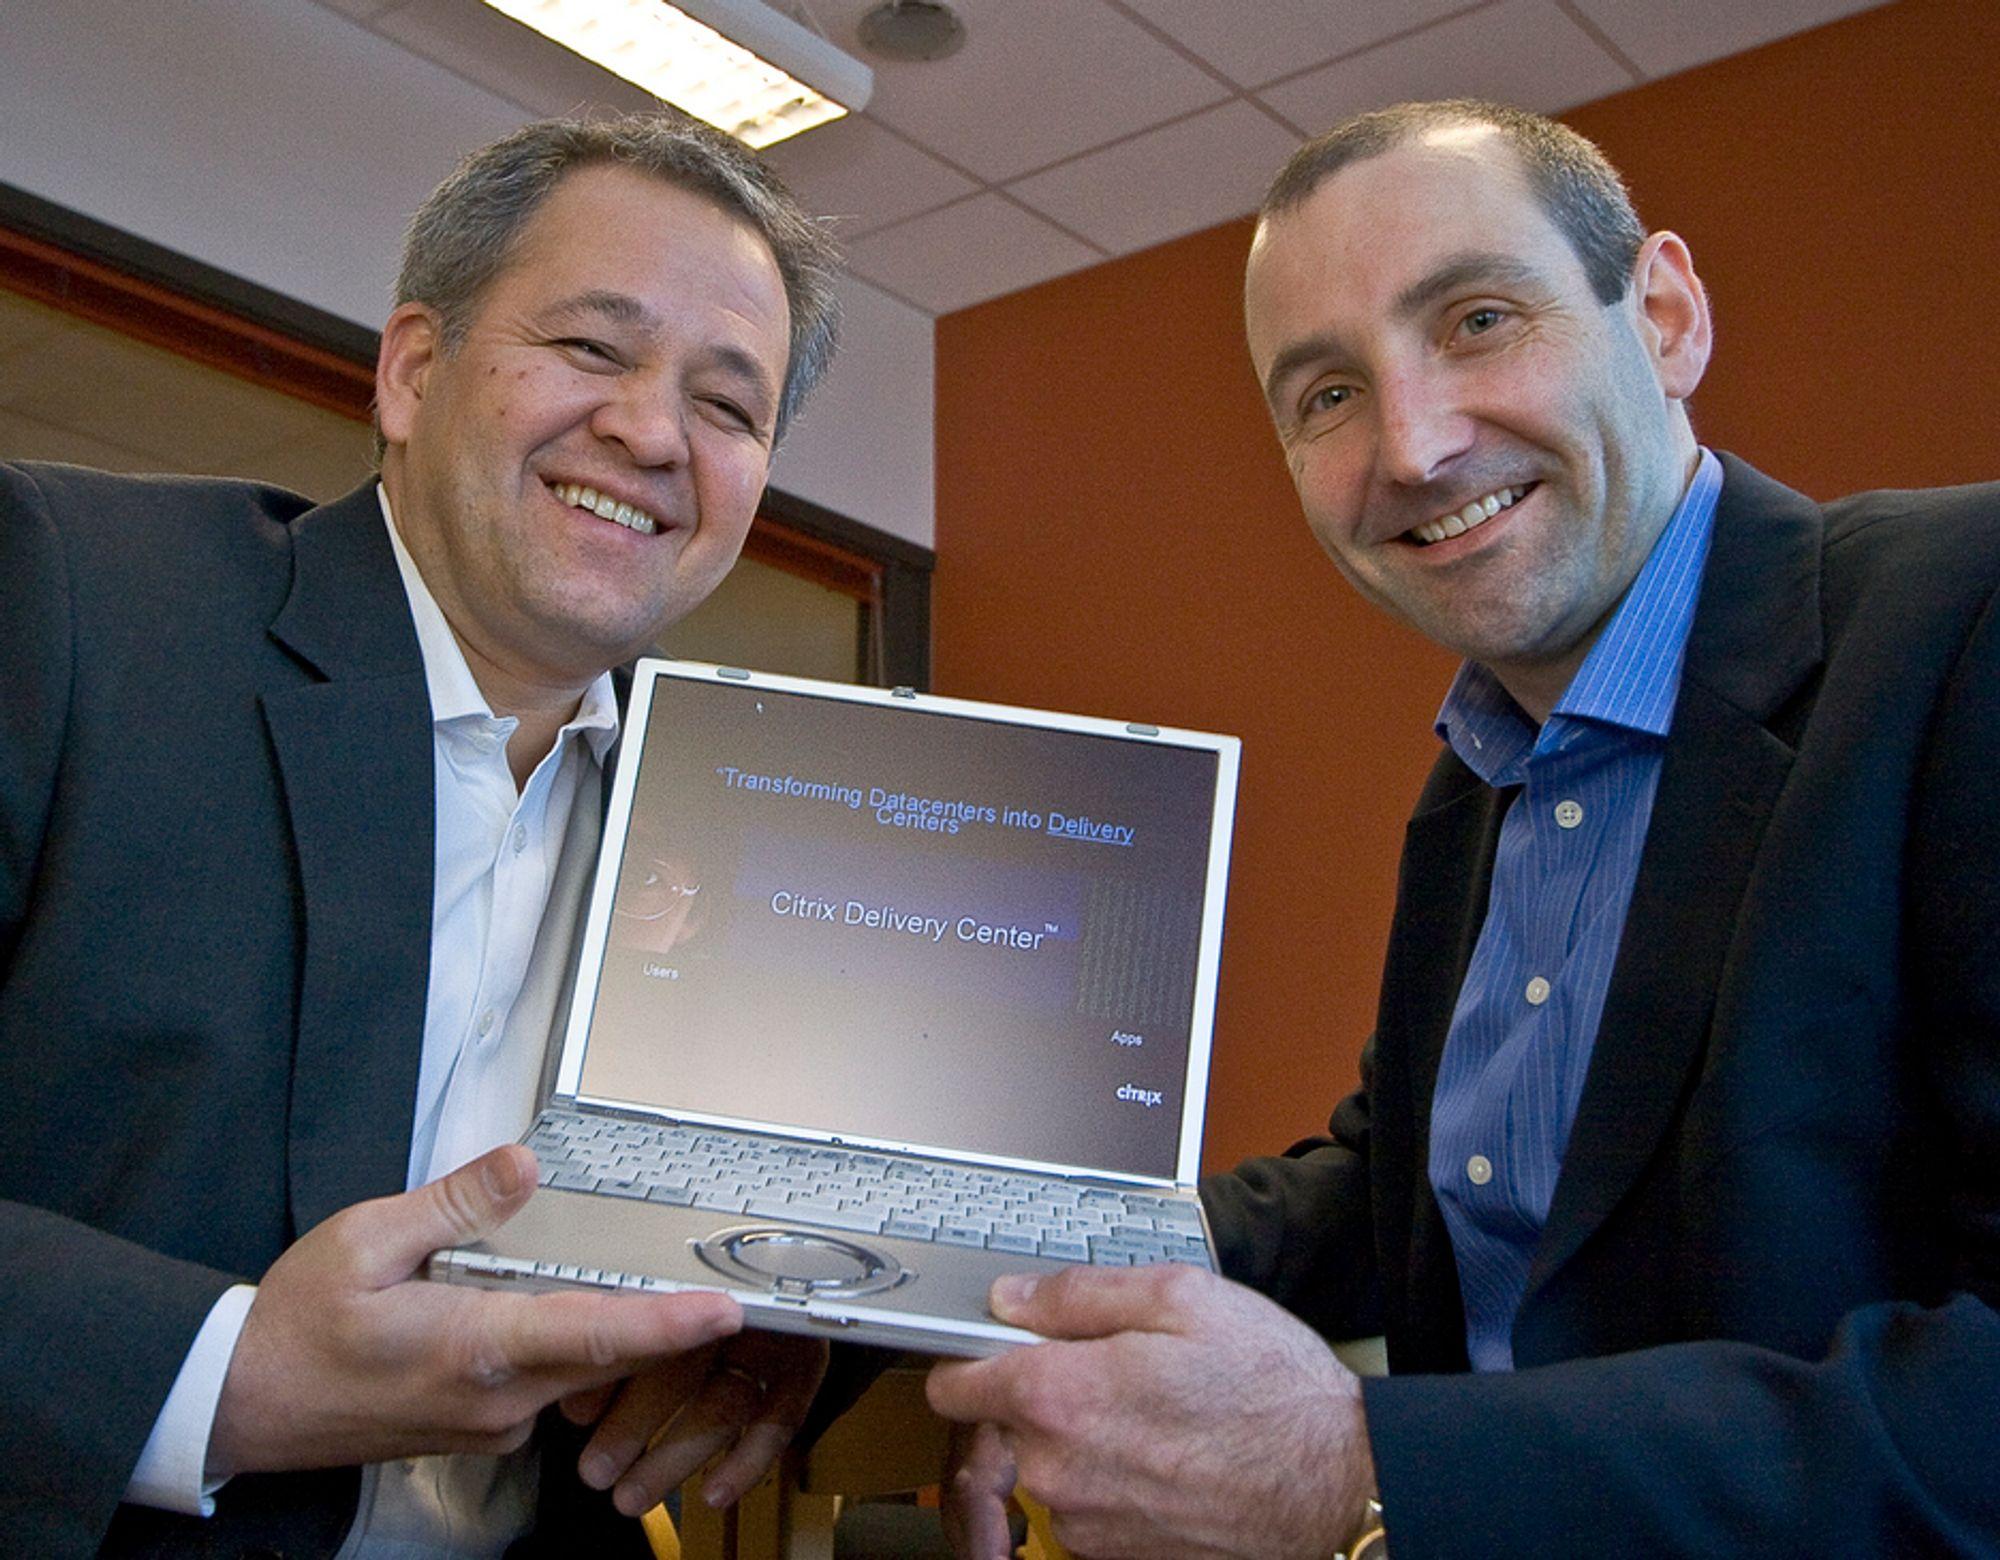 BILLIGERE OG BEDRE: Citrix norgessjef, James Dudek selger virtualiseringens glade budskap sammen med Dave Austin.